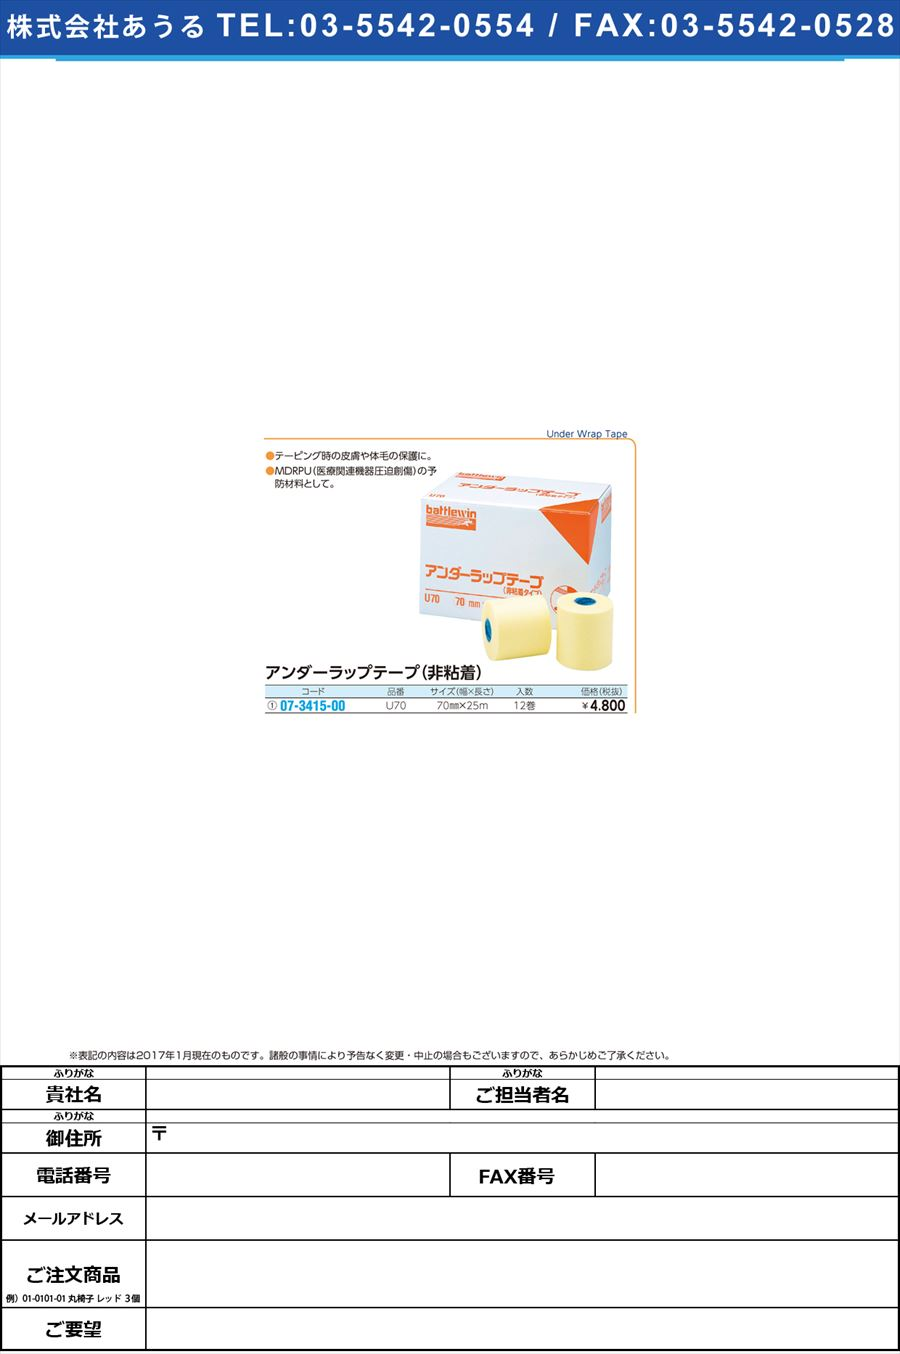 BW アンダーラップテープ BWアンダーラップテープ U70(70MMX25M)12カン(07-3415-00)【1箱単位】【2017年カタログ商品】